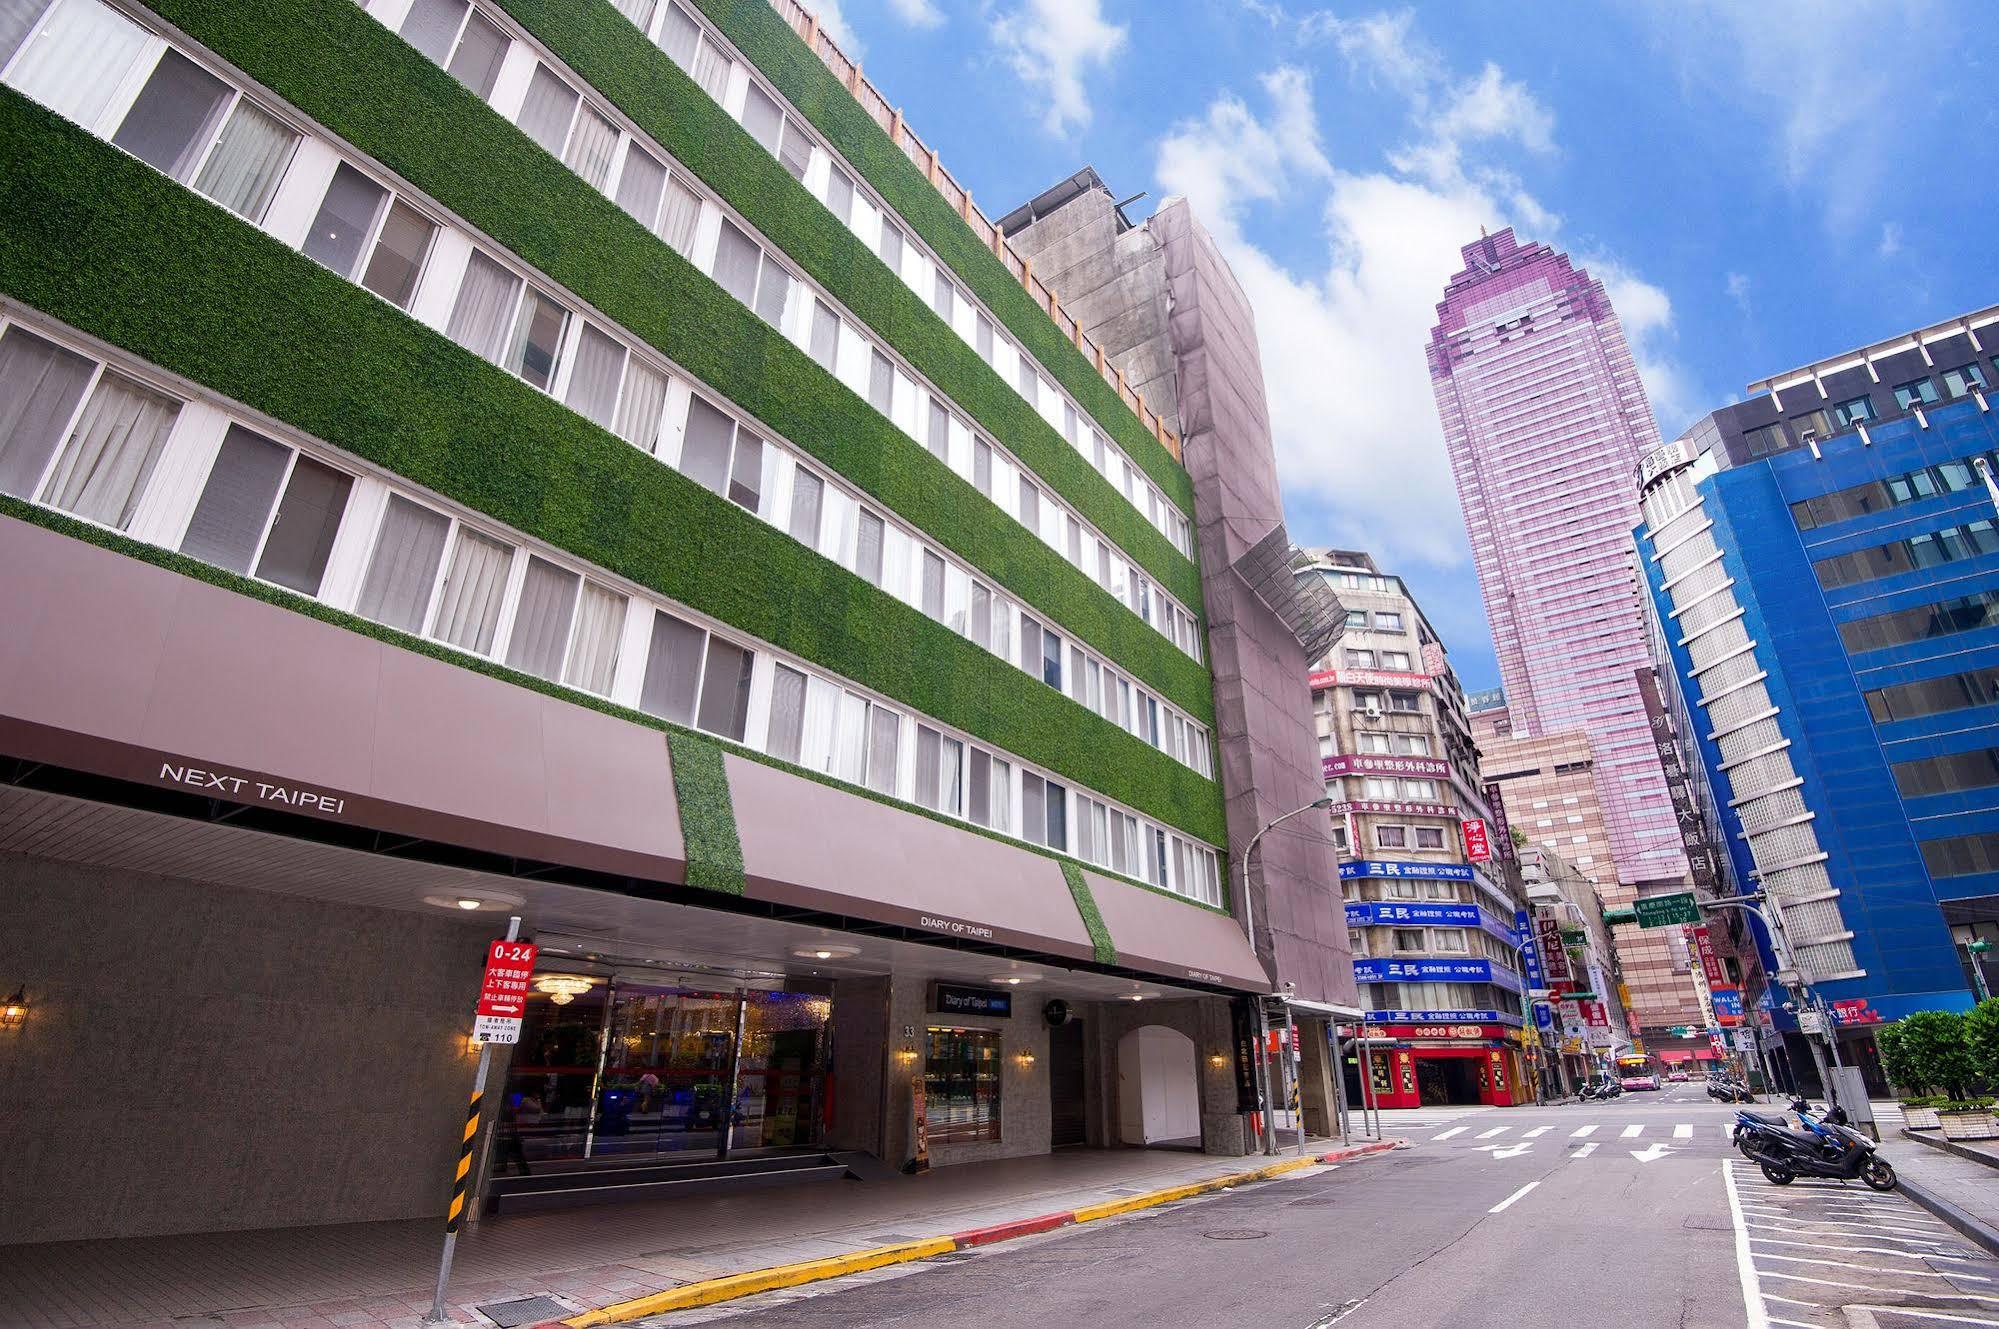 Moshamanla Hotel Main Station